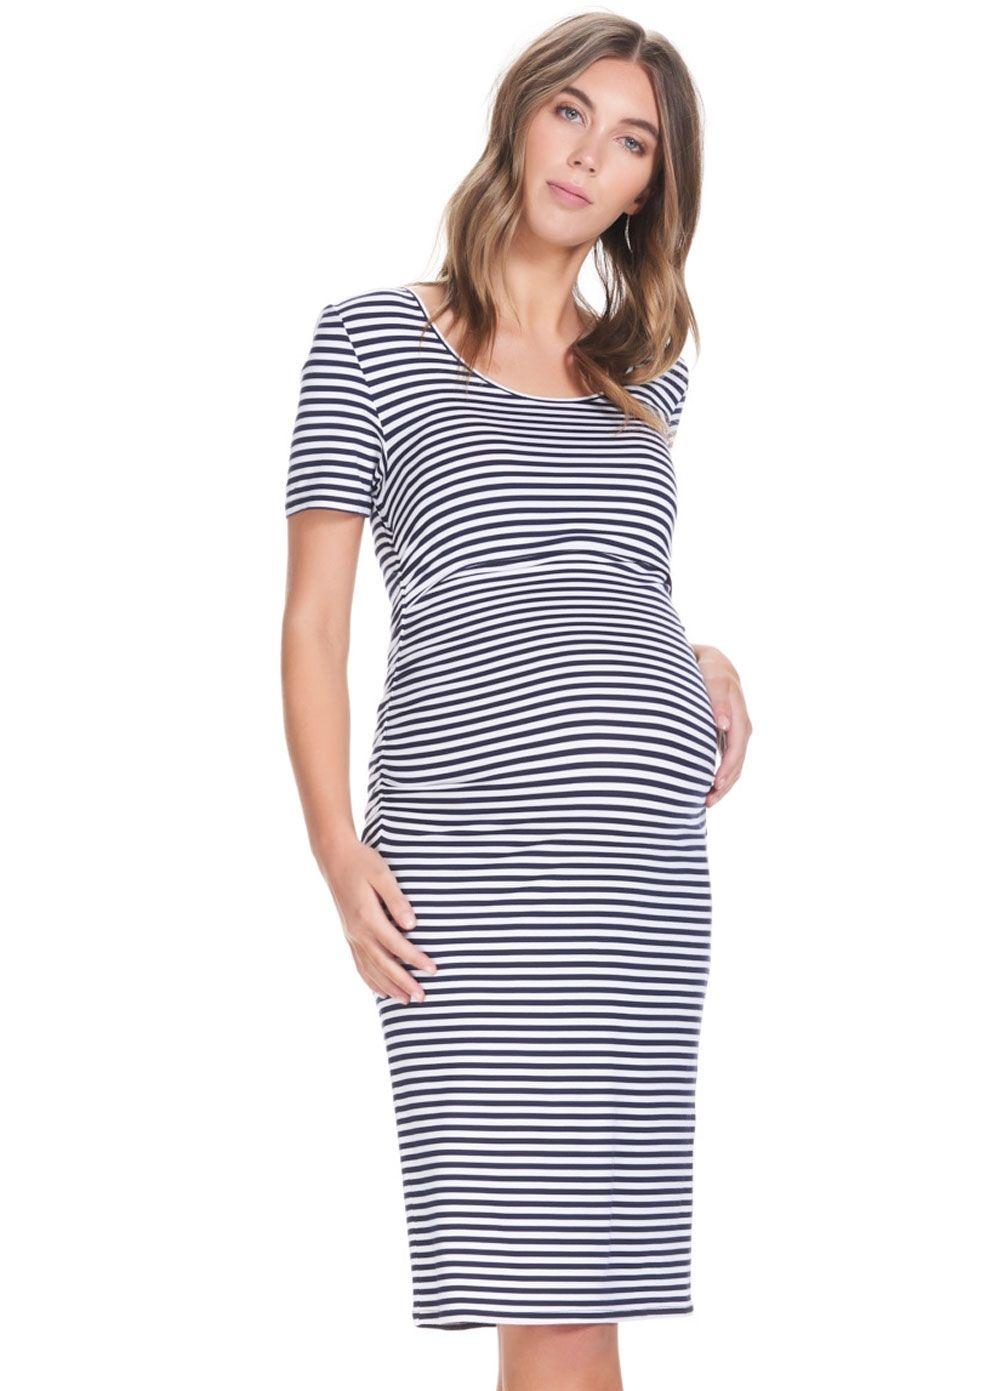 e12e19f6d60dd Soon Maternity - Stella Feeding T-Shirt Dress | Pregos/Nursing ...